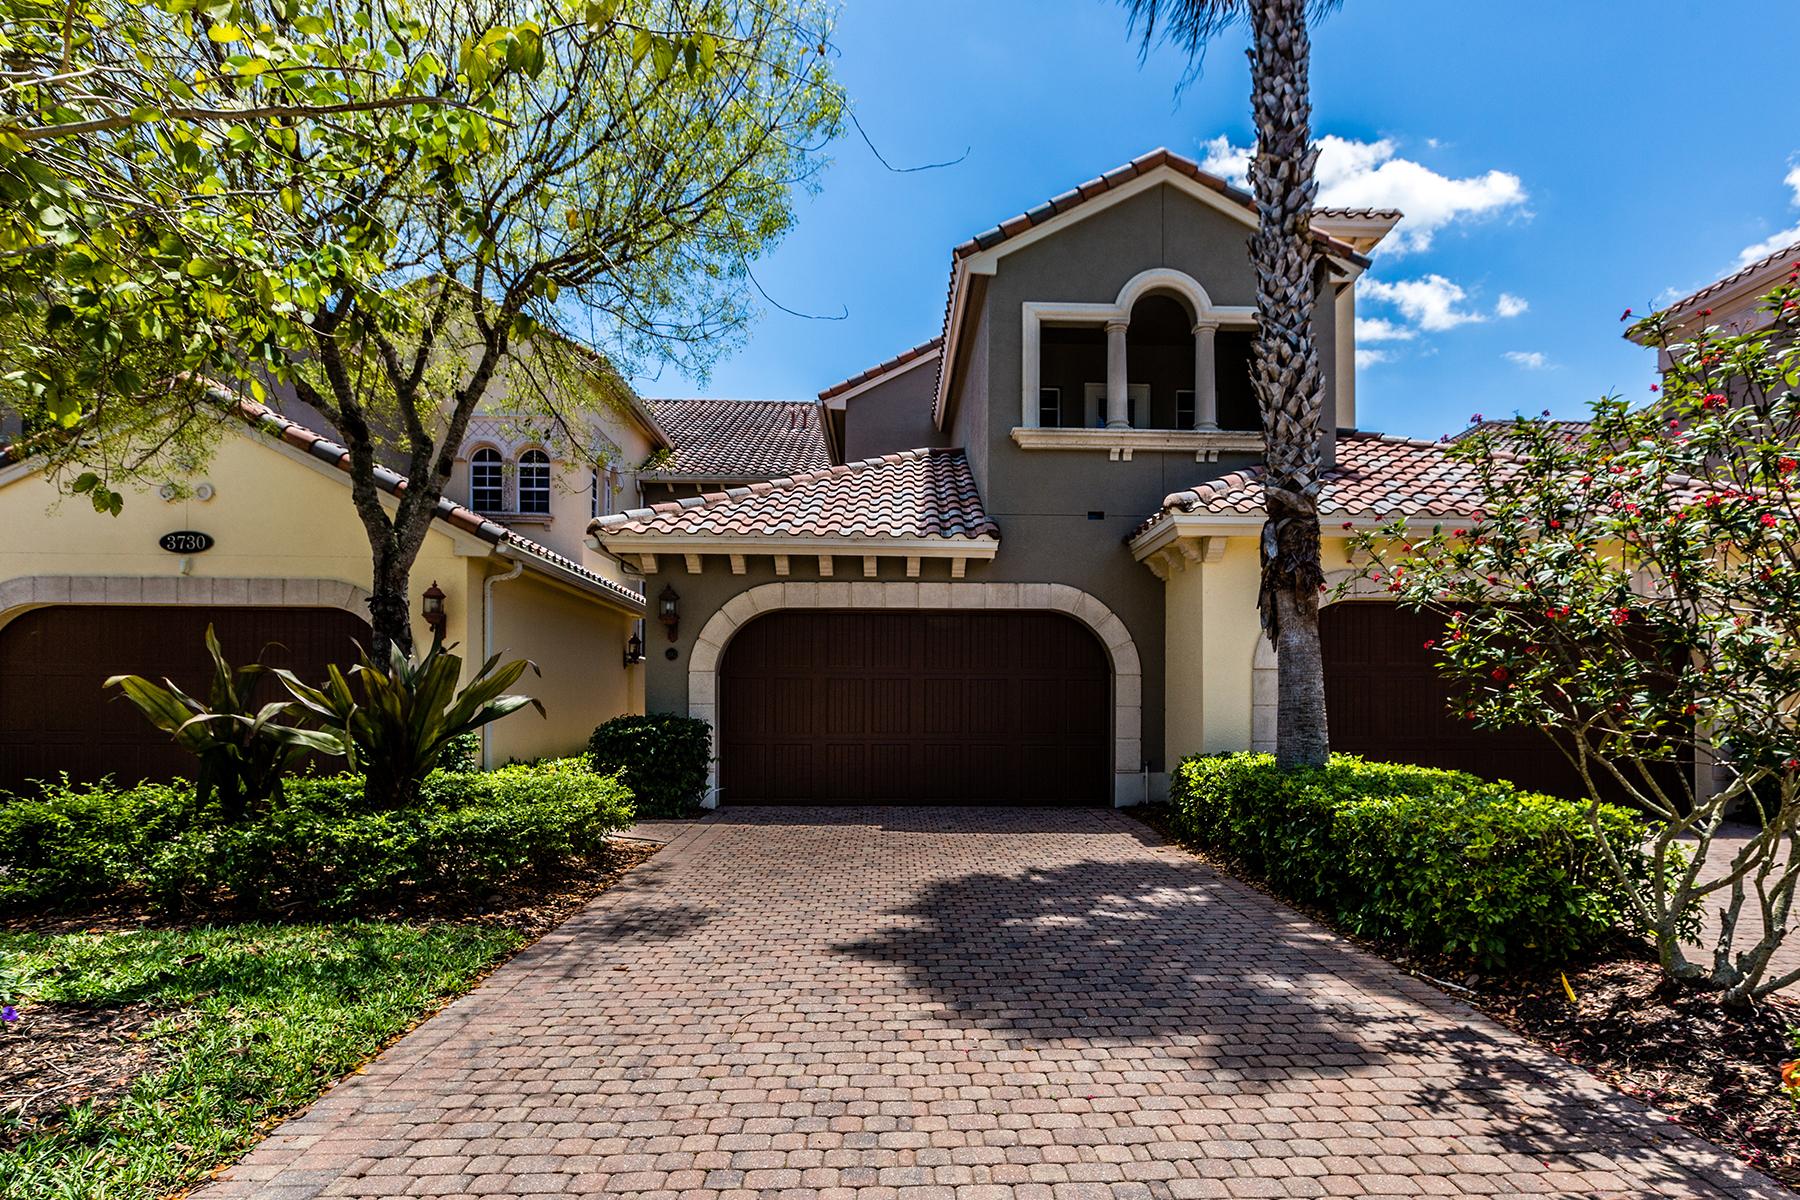 Condominium for Sale at FEDDLERS CREEK - MONTREUS 3730 Montreux Ln 202 Naples, Florida, 34114 United States